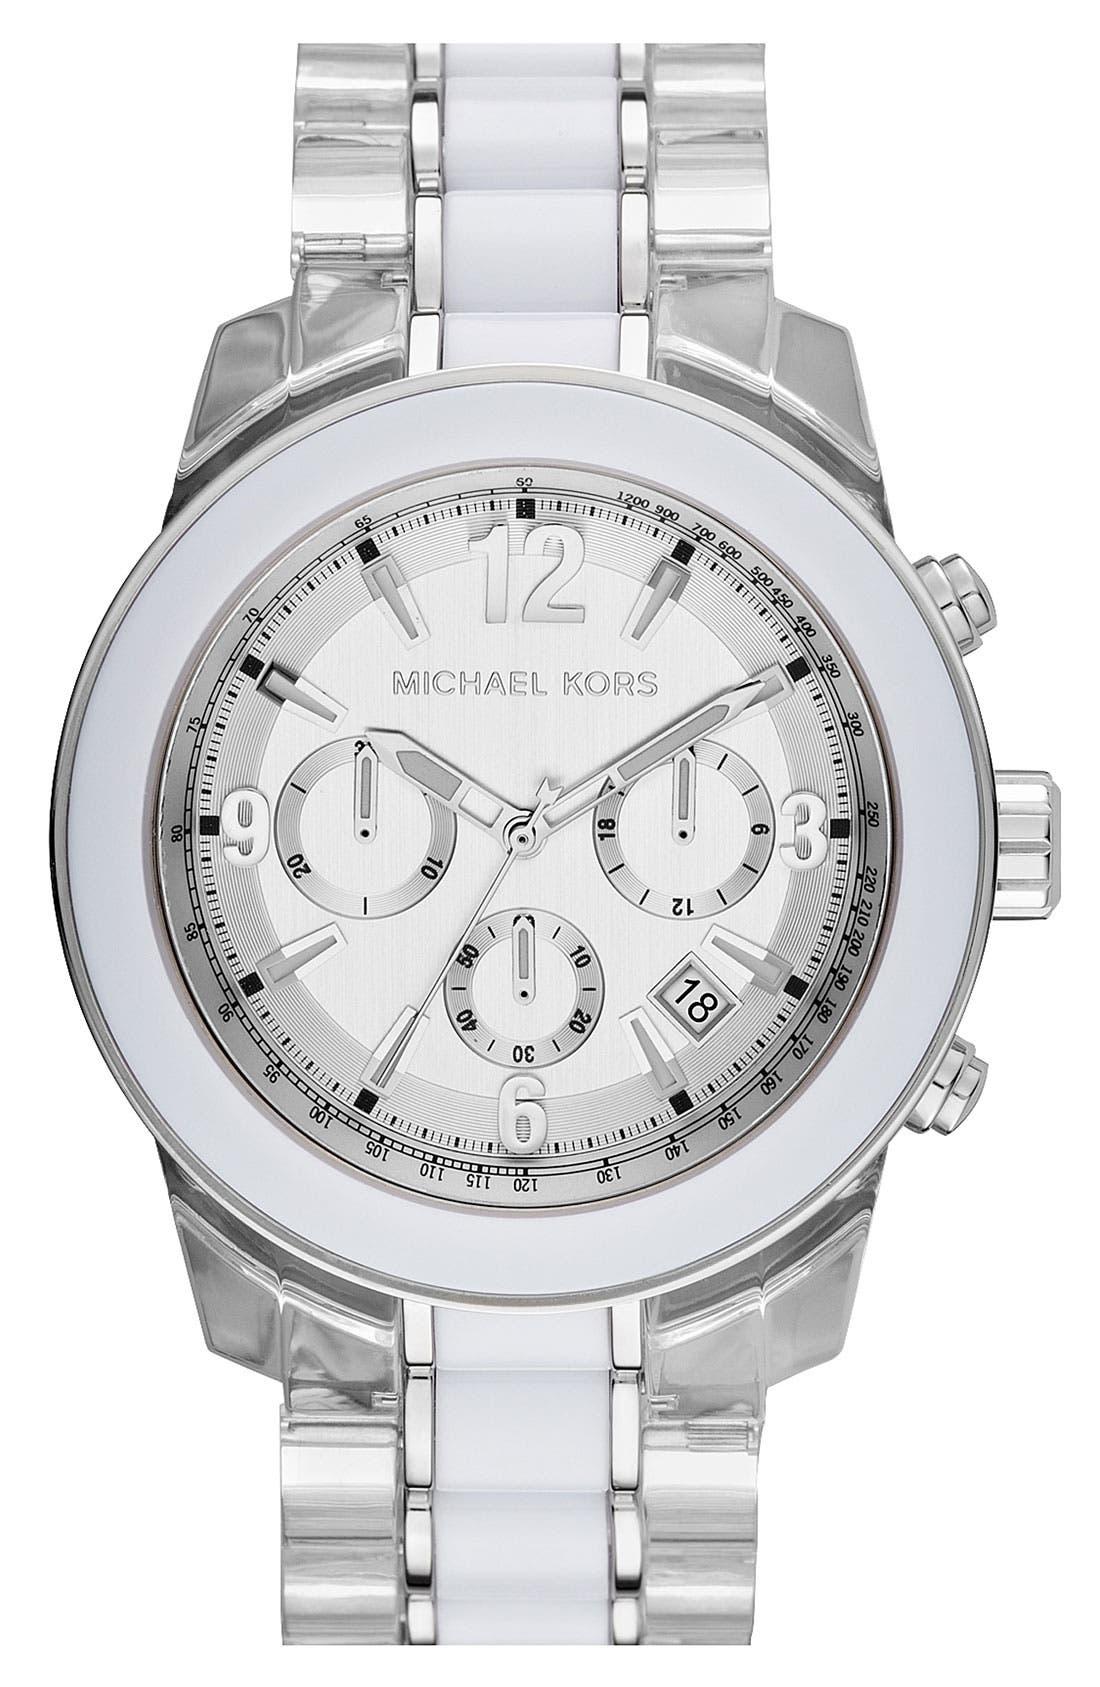 Main Image - Michael Kors 'Preston' Two Tone Chronograph Bracelet Watch, 45mm